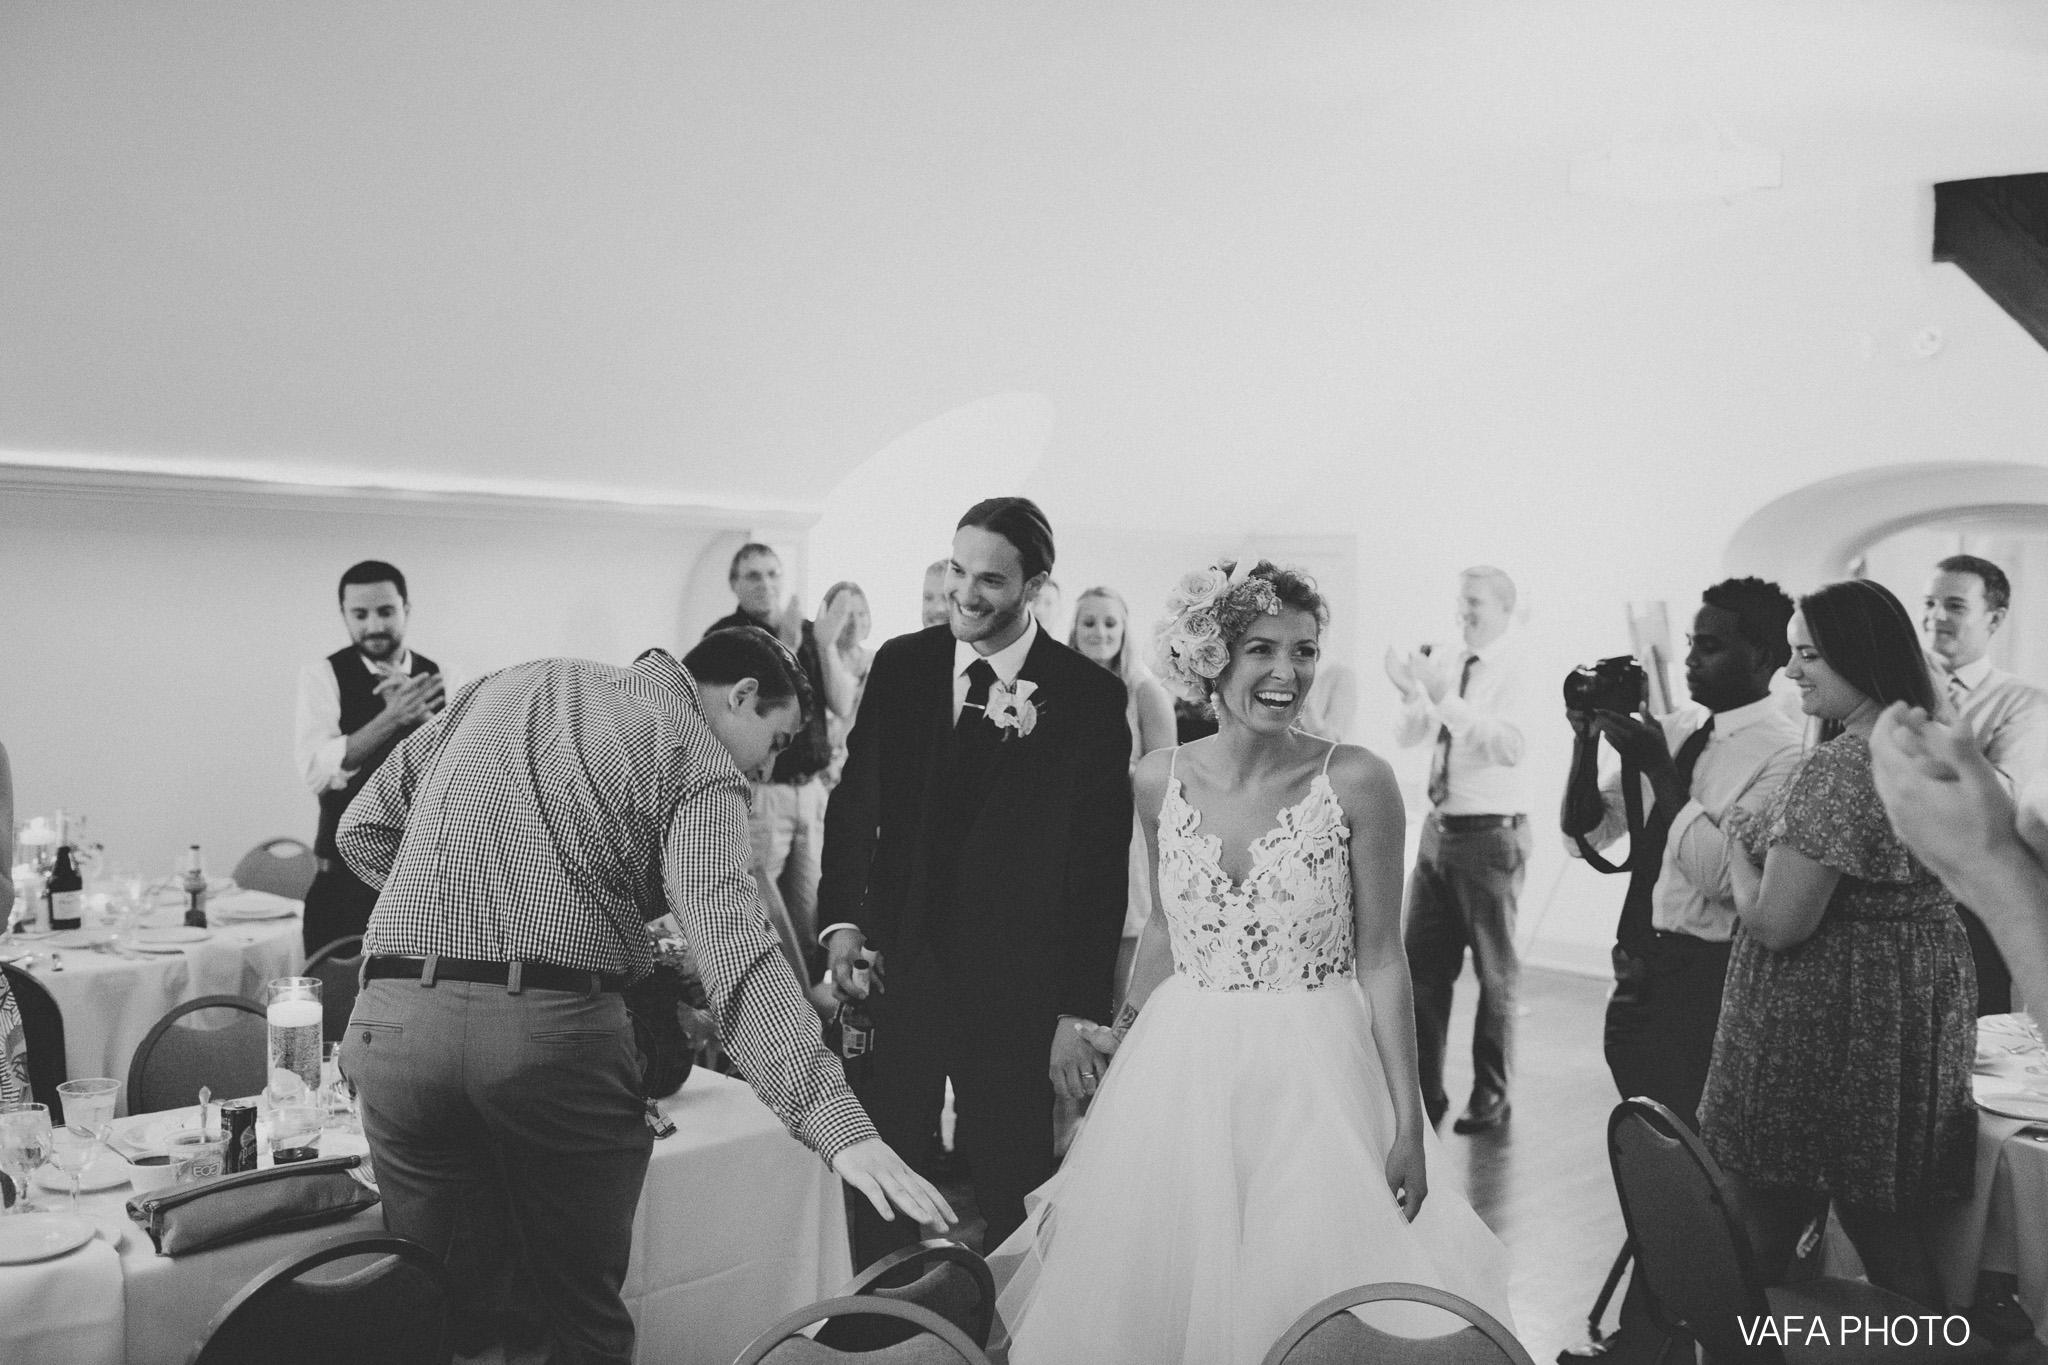 The-Felt-Estate-Wedding-Kailie-David-Vafa-Photo-929.jpg